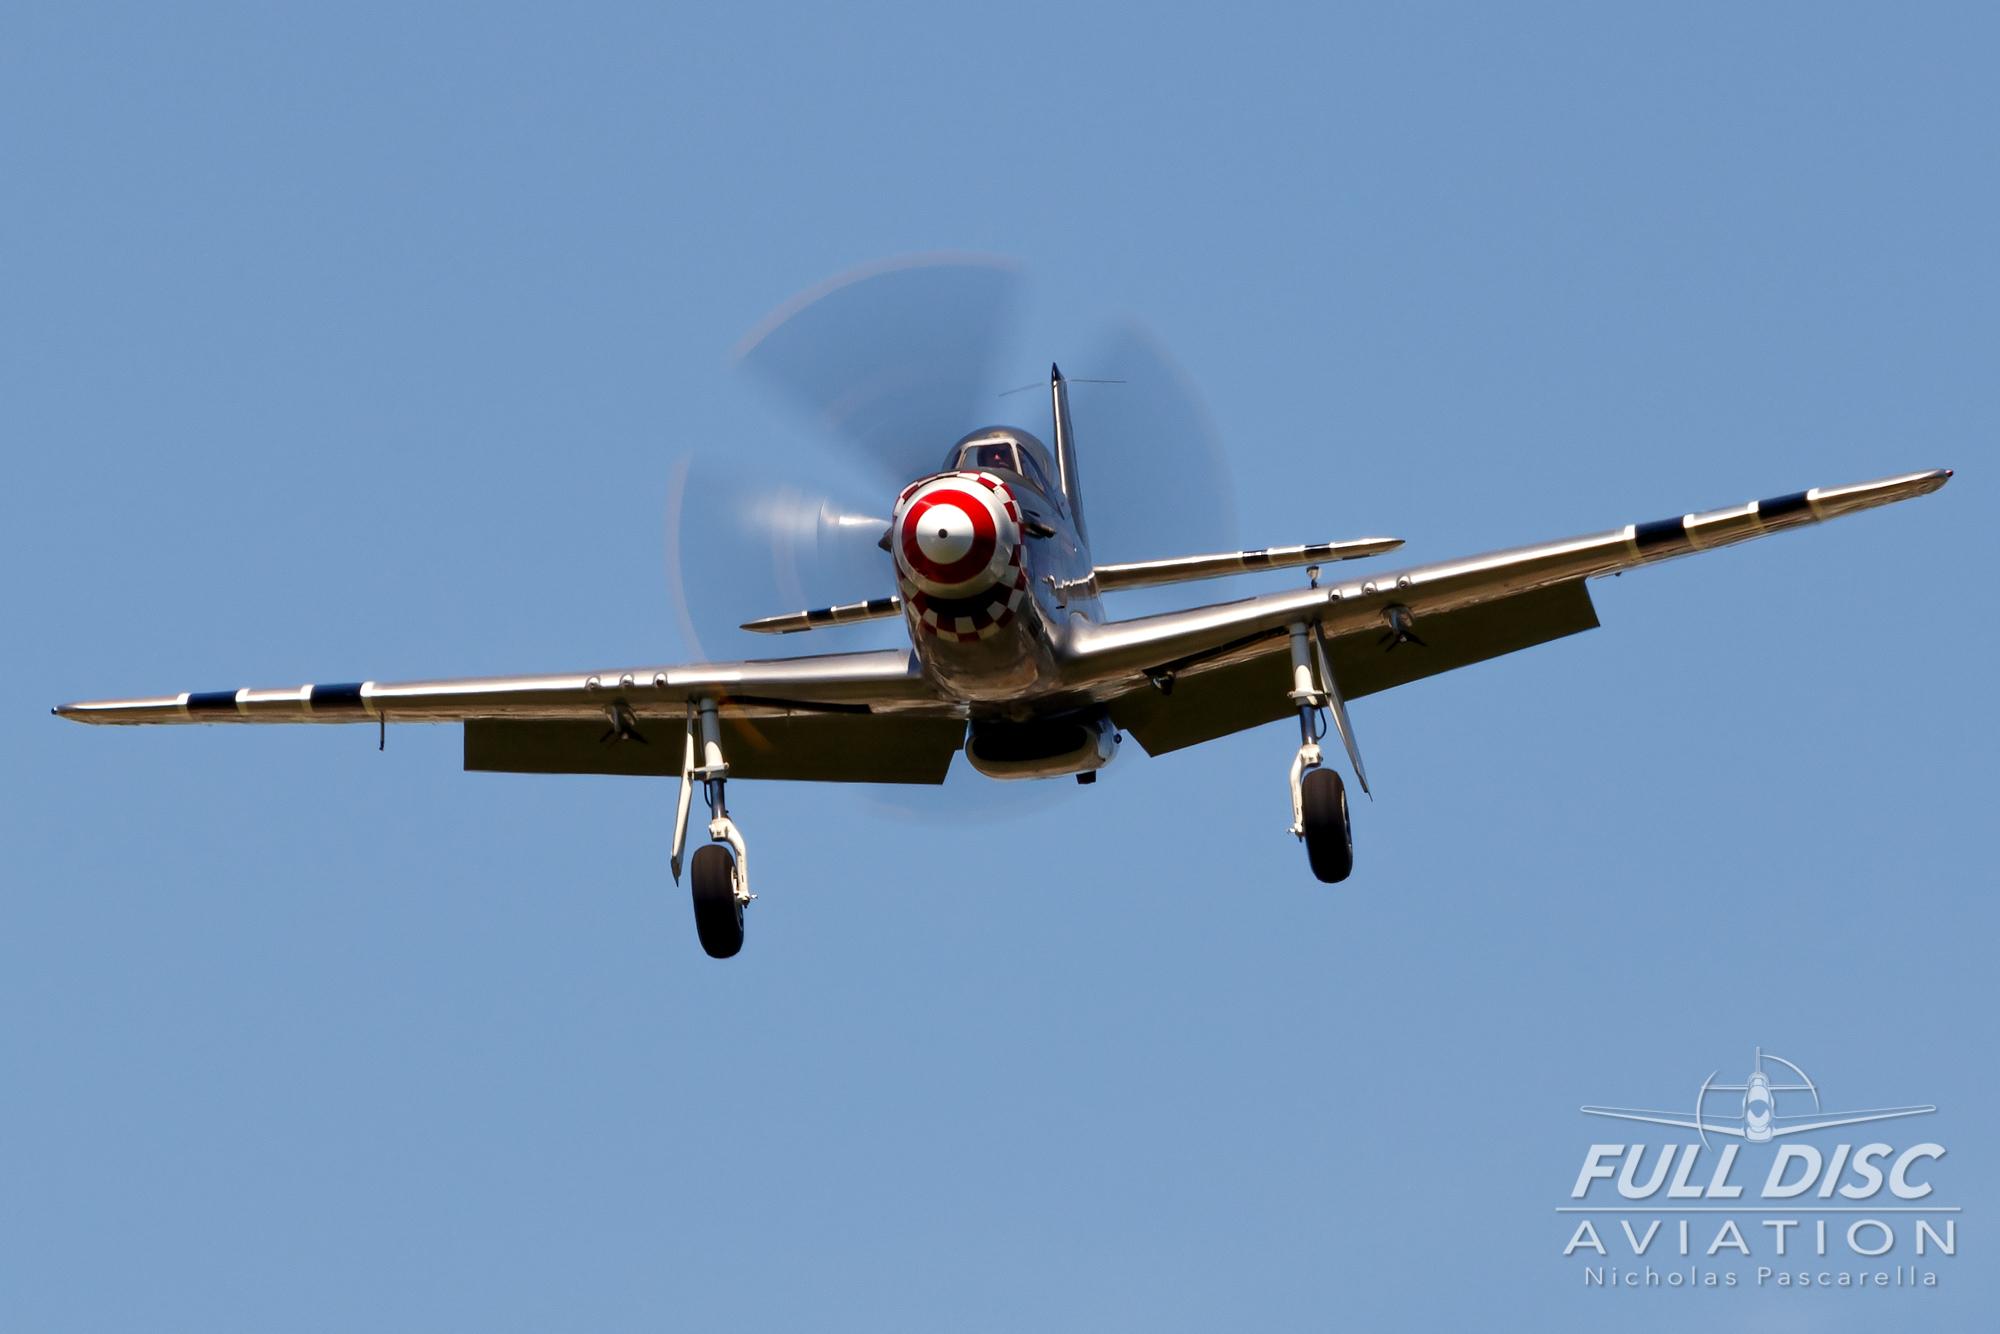 americanairpowermuseum_nicholaspascarella_nickpascarella_fulldiscaviation_legendsofairpower2019_aviation_warbird_p51_landing_.jpg